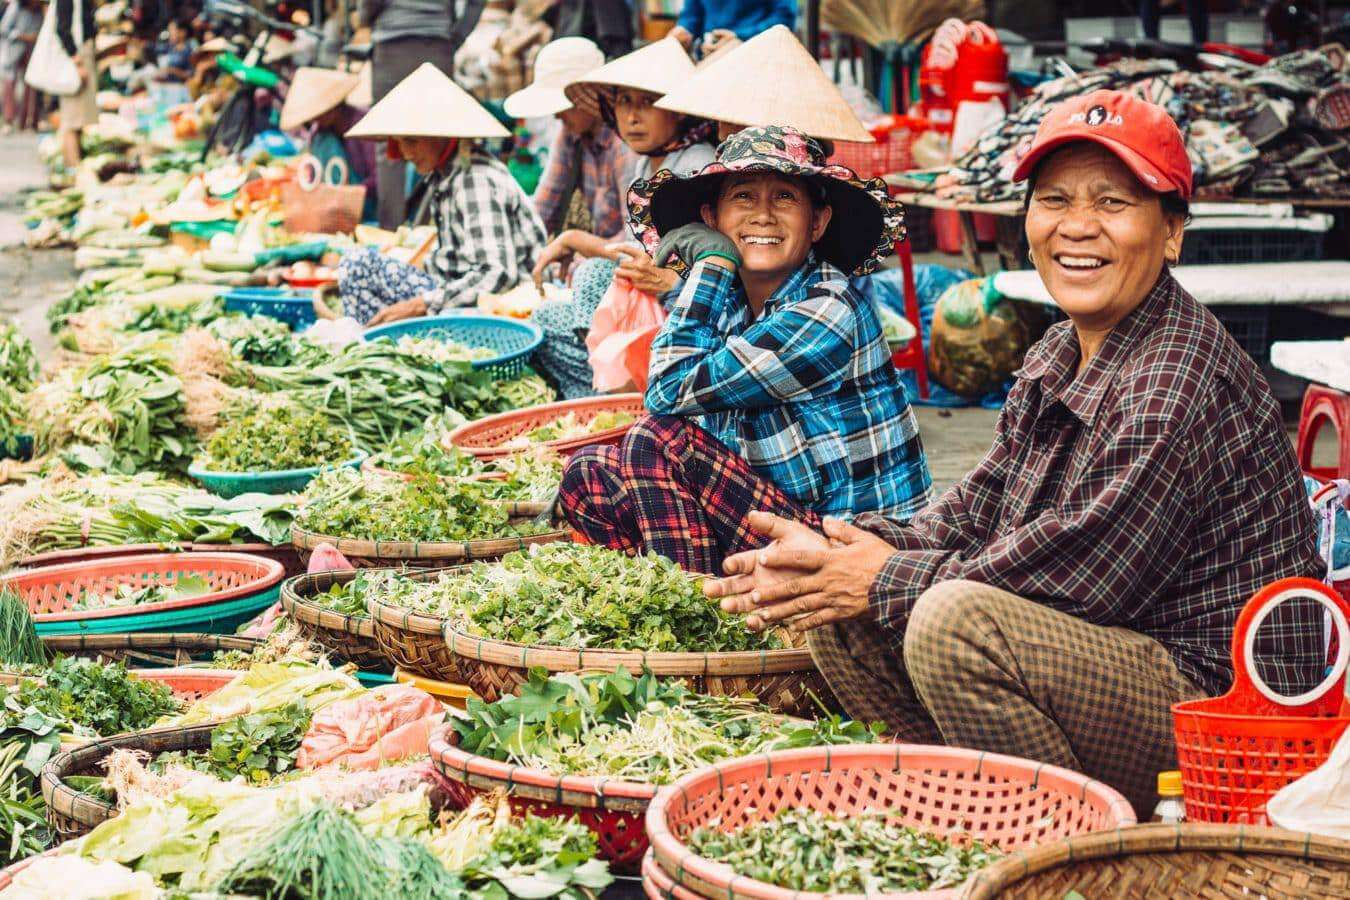 Market sellers - Hoi An's markets